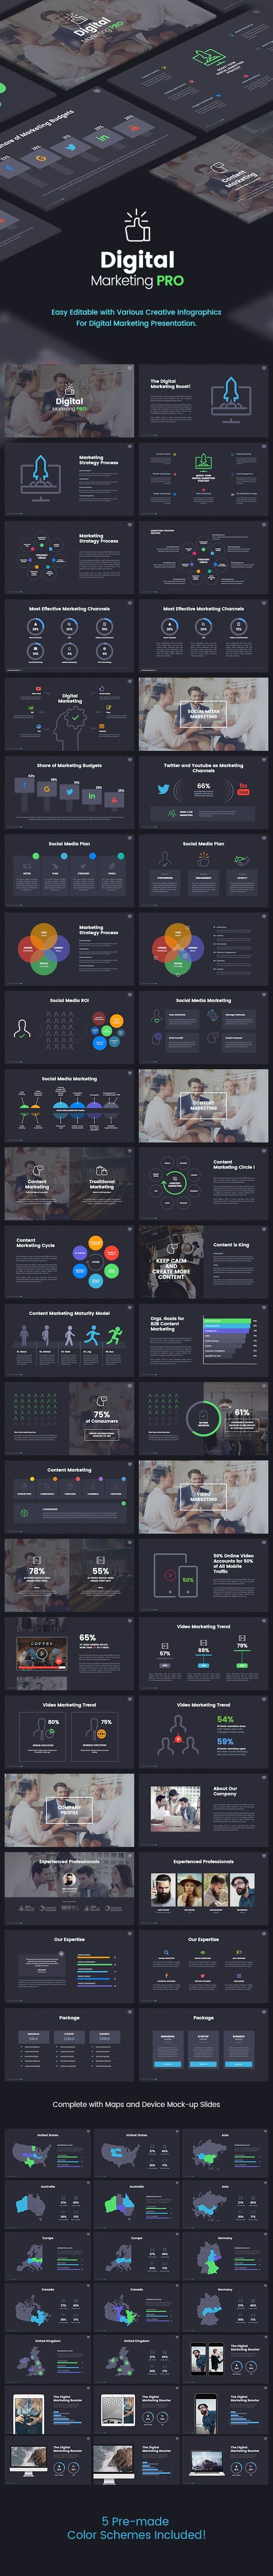 The Digital Marketing Pro - Keynote Template | Keynote, Digital ...